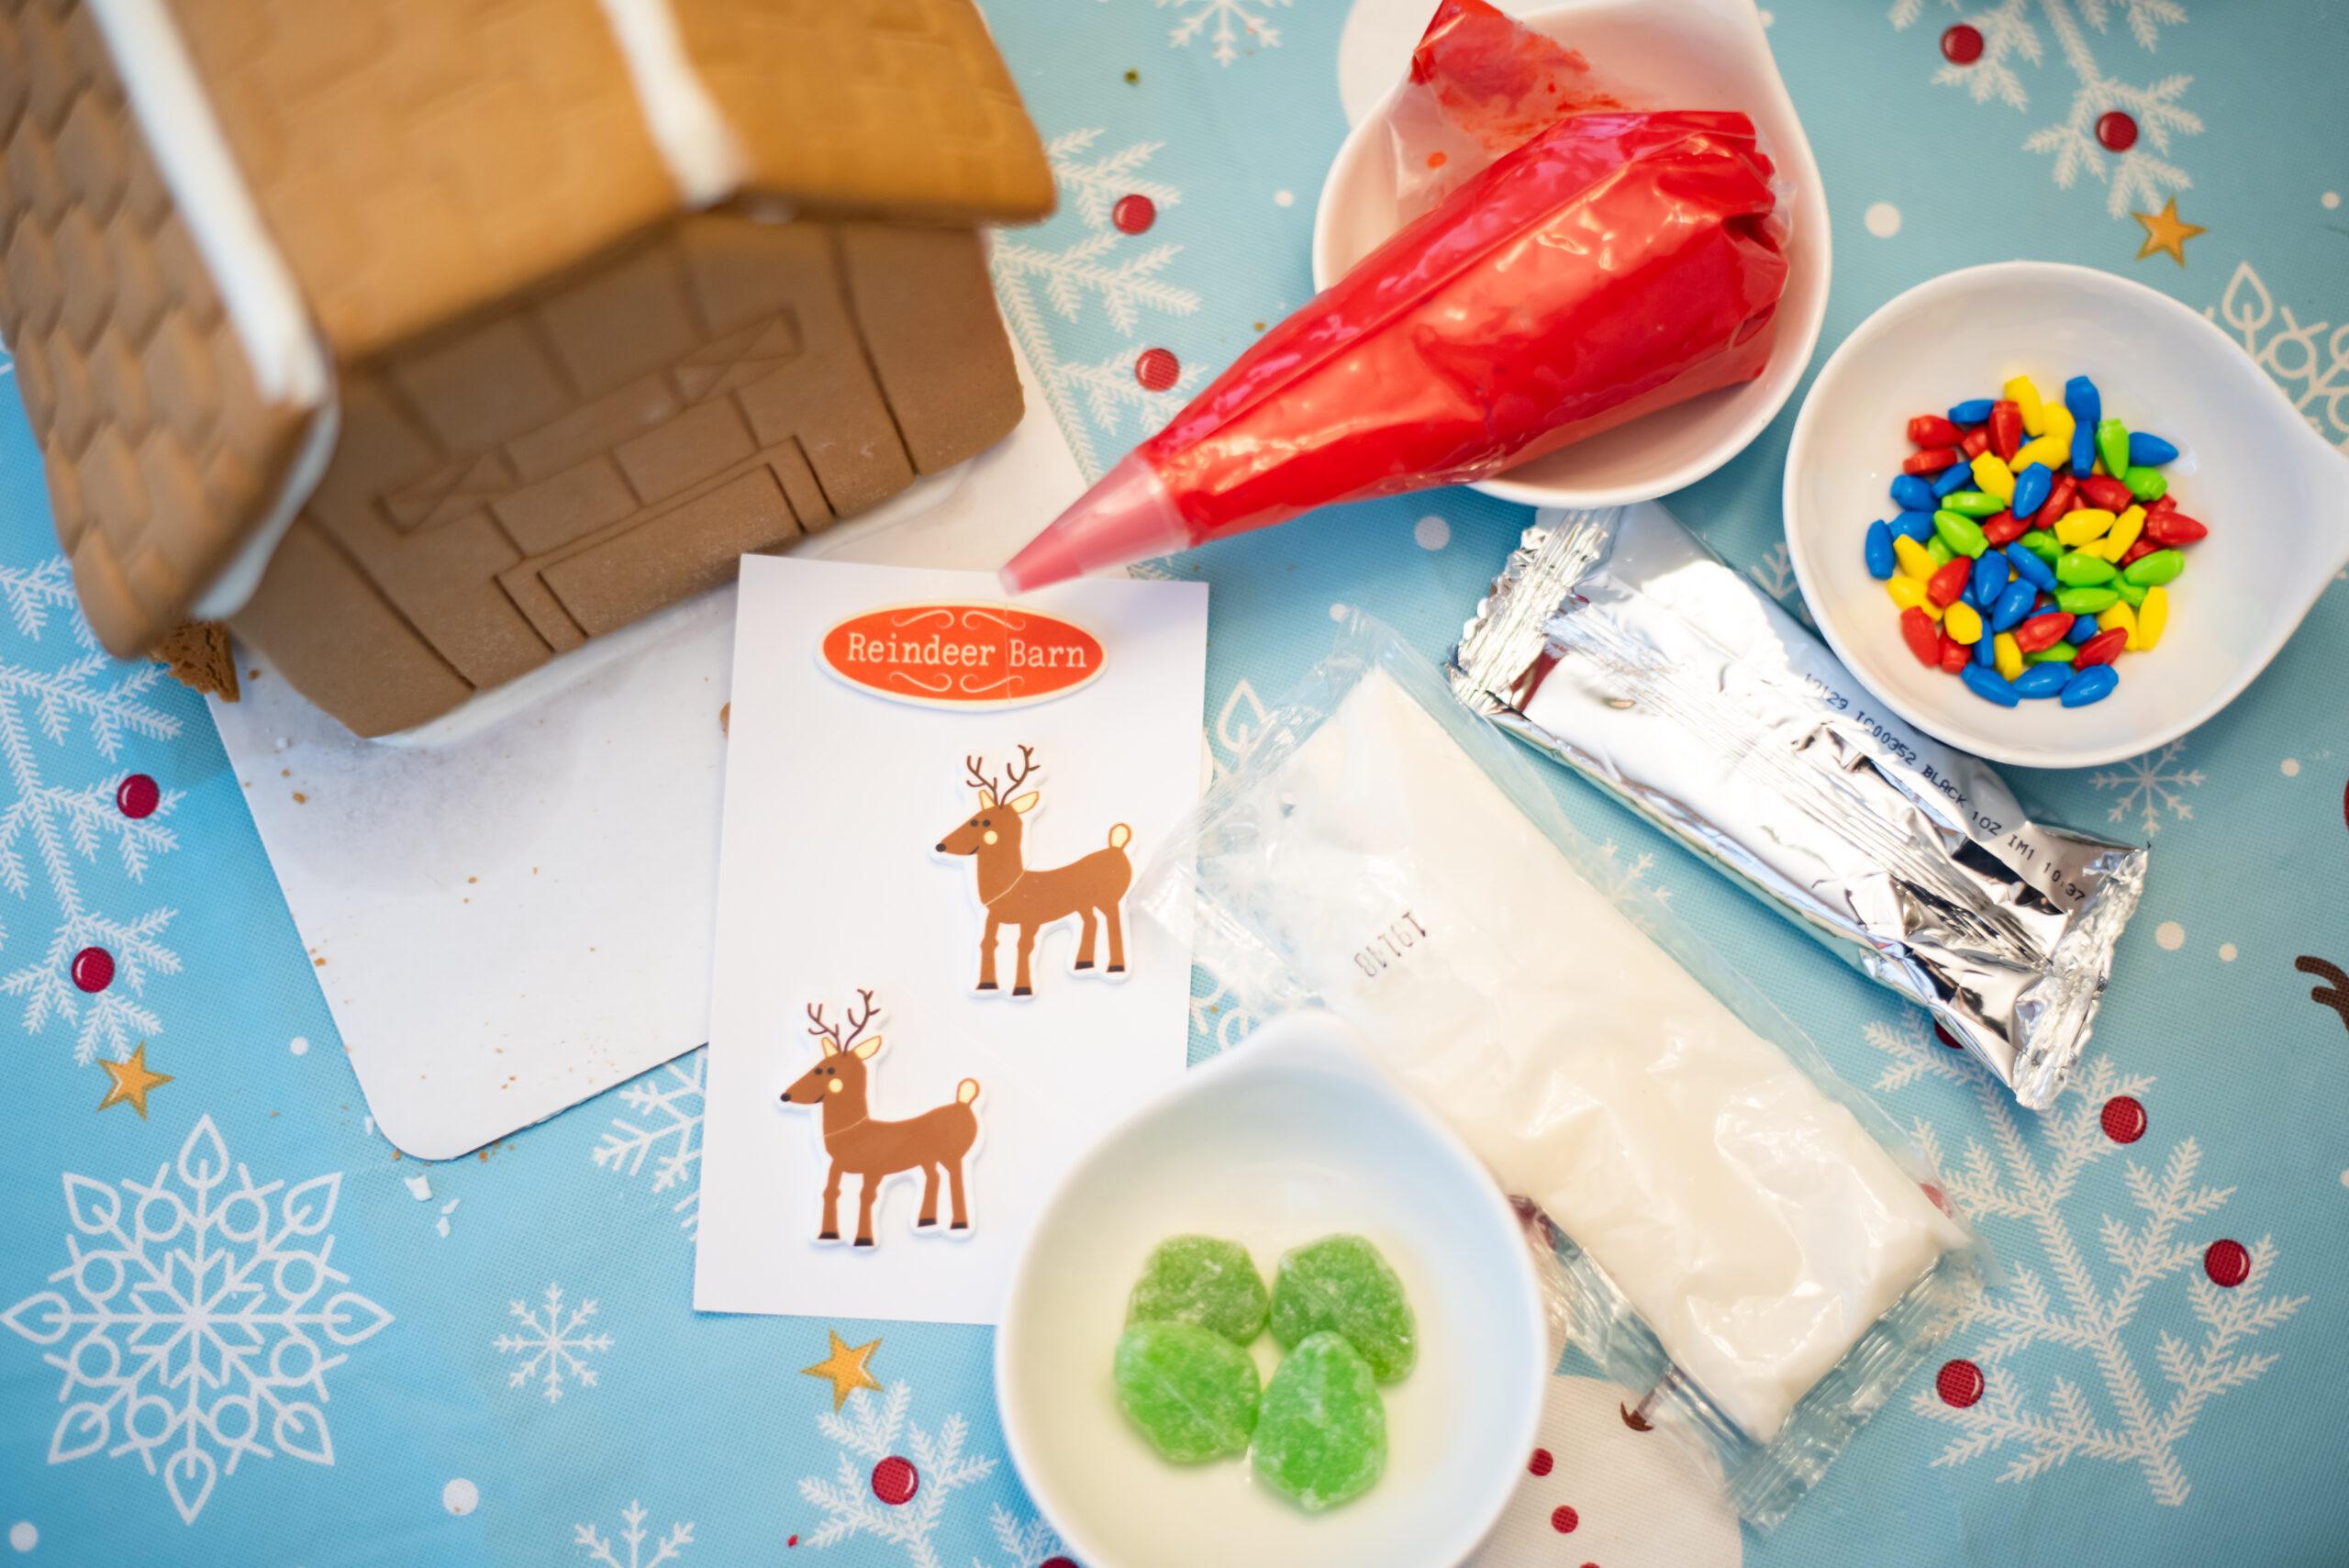 gingerbread house kit tip